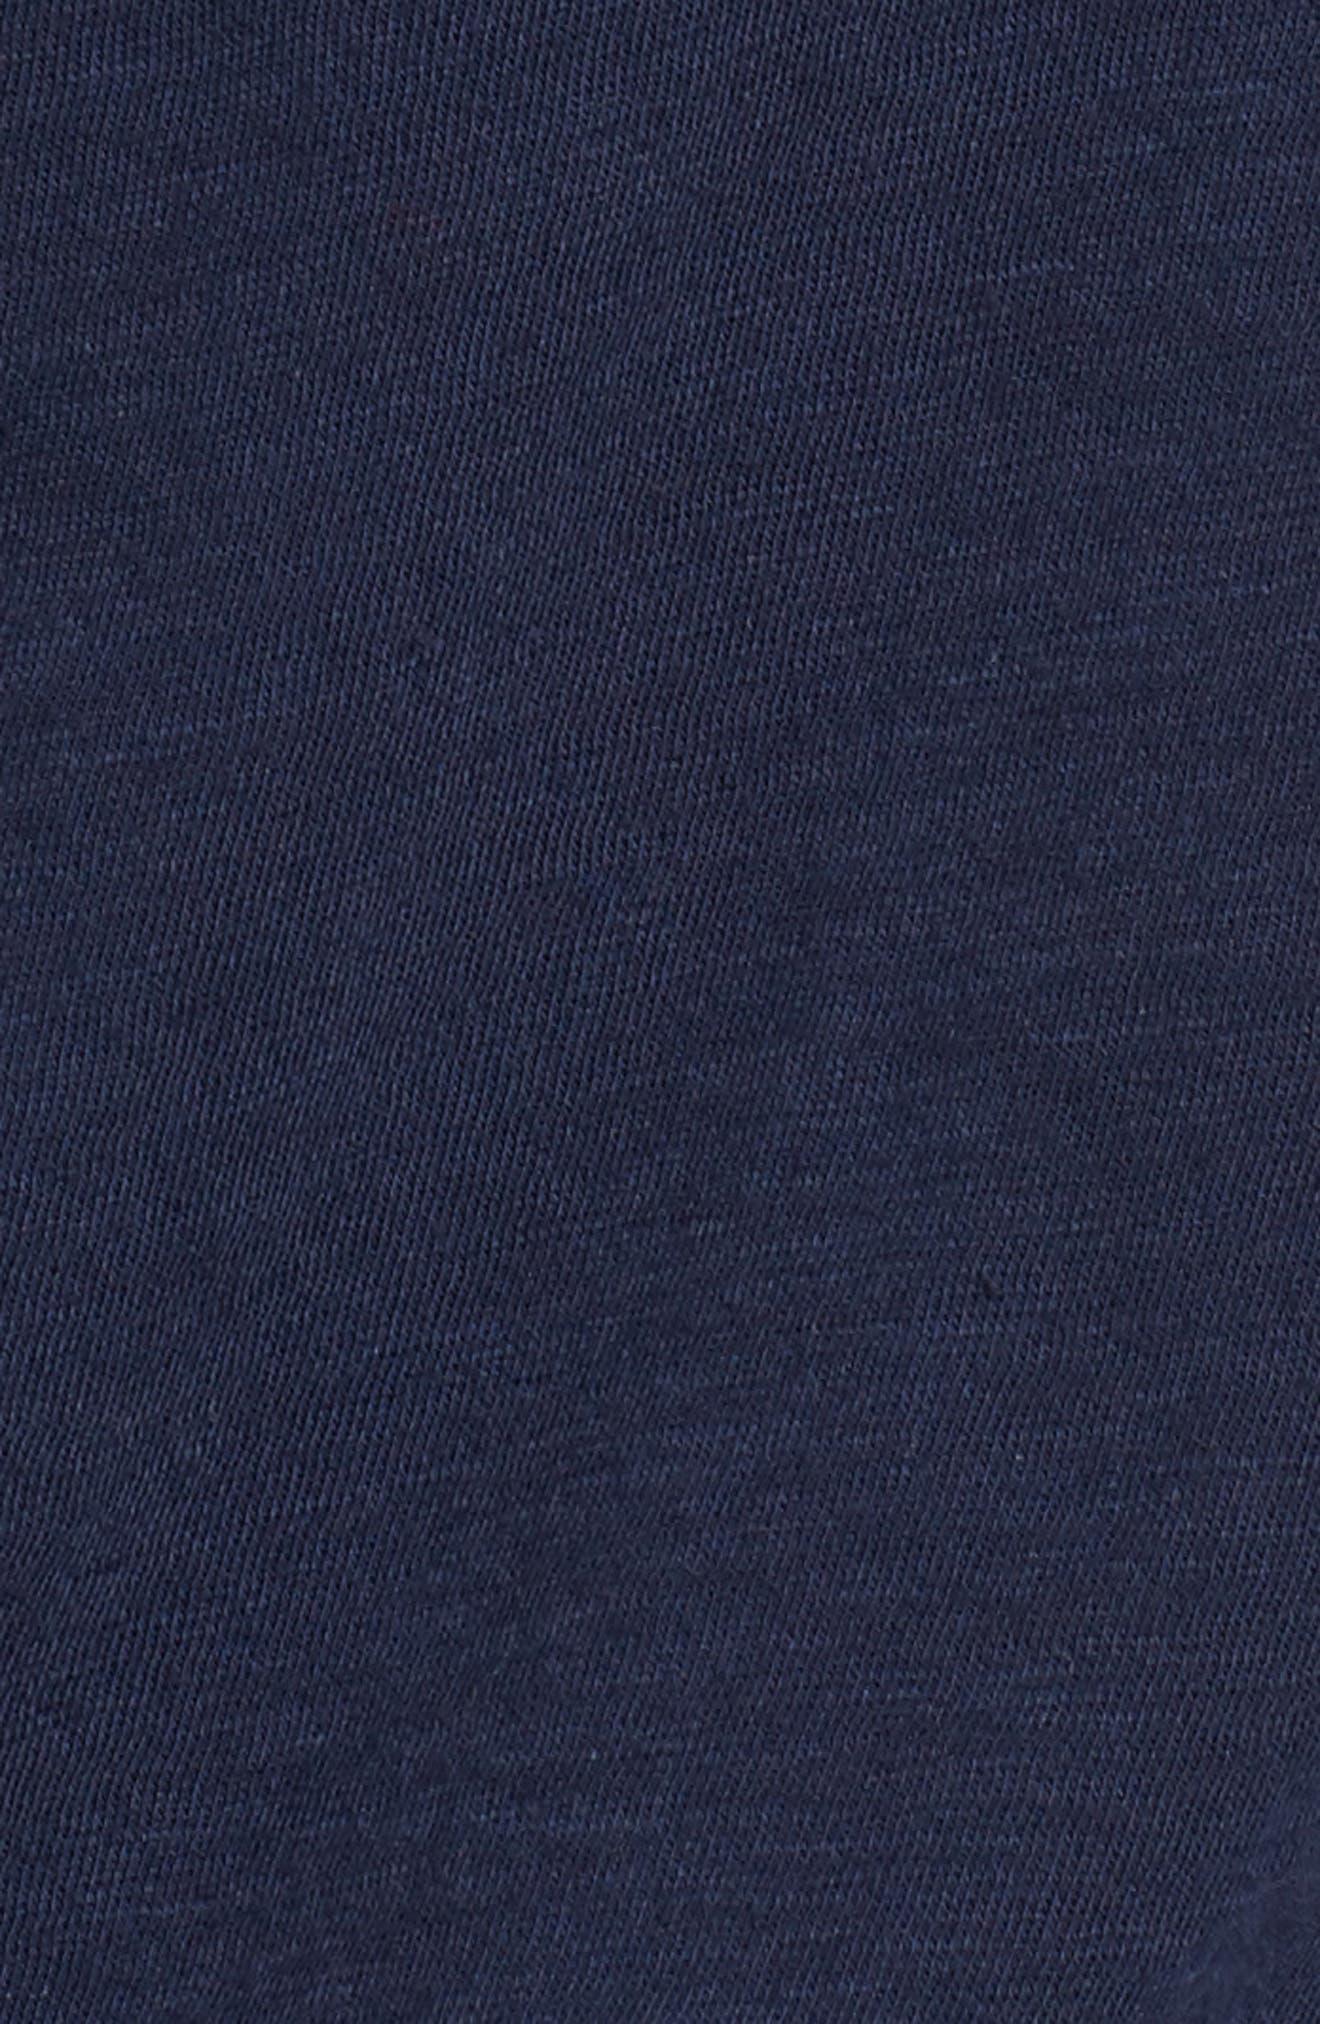 Alternate Image 5  - Sundry Stars Stripes Stilettos Tee (Nordstrom Exclusive)